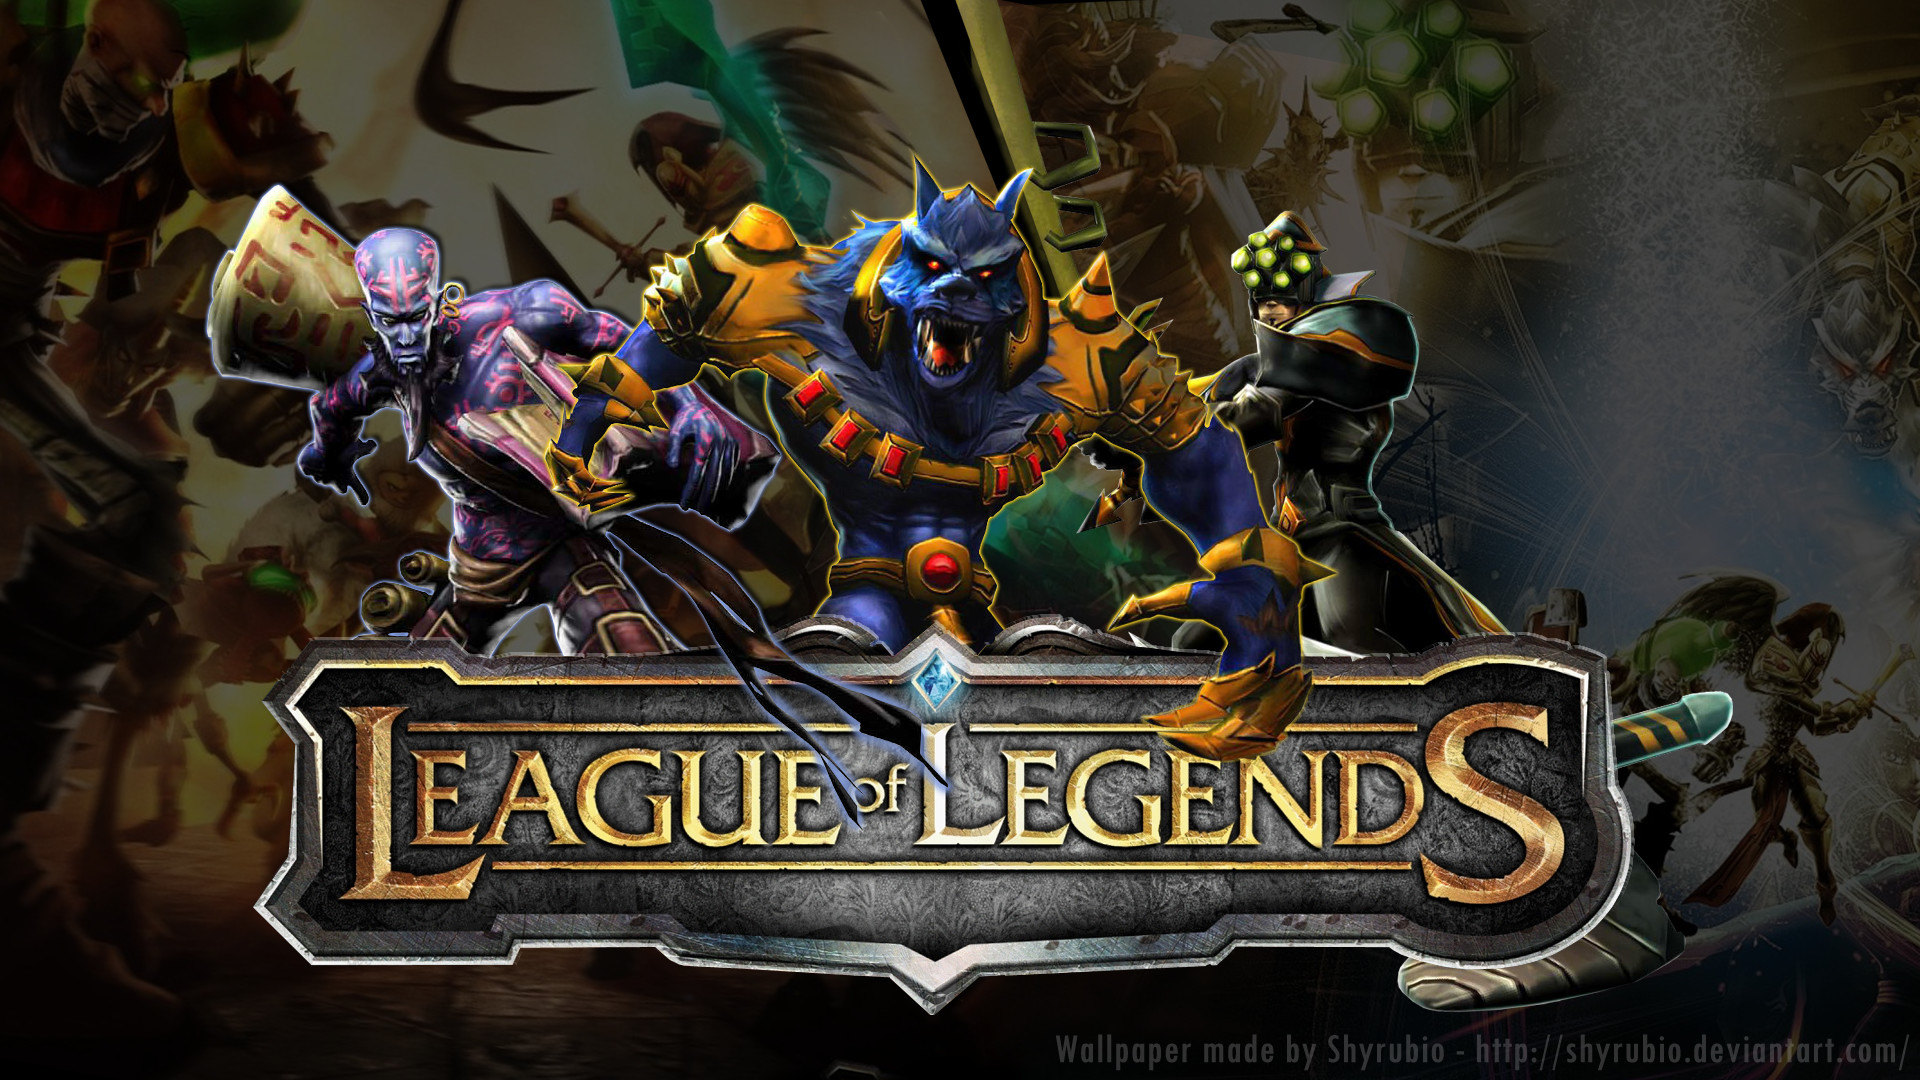 Res: 1920x1080, ... League Of Legends - Wallpaper by shyrubio